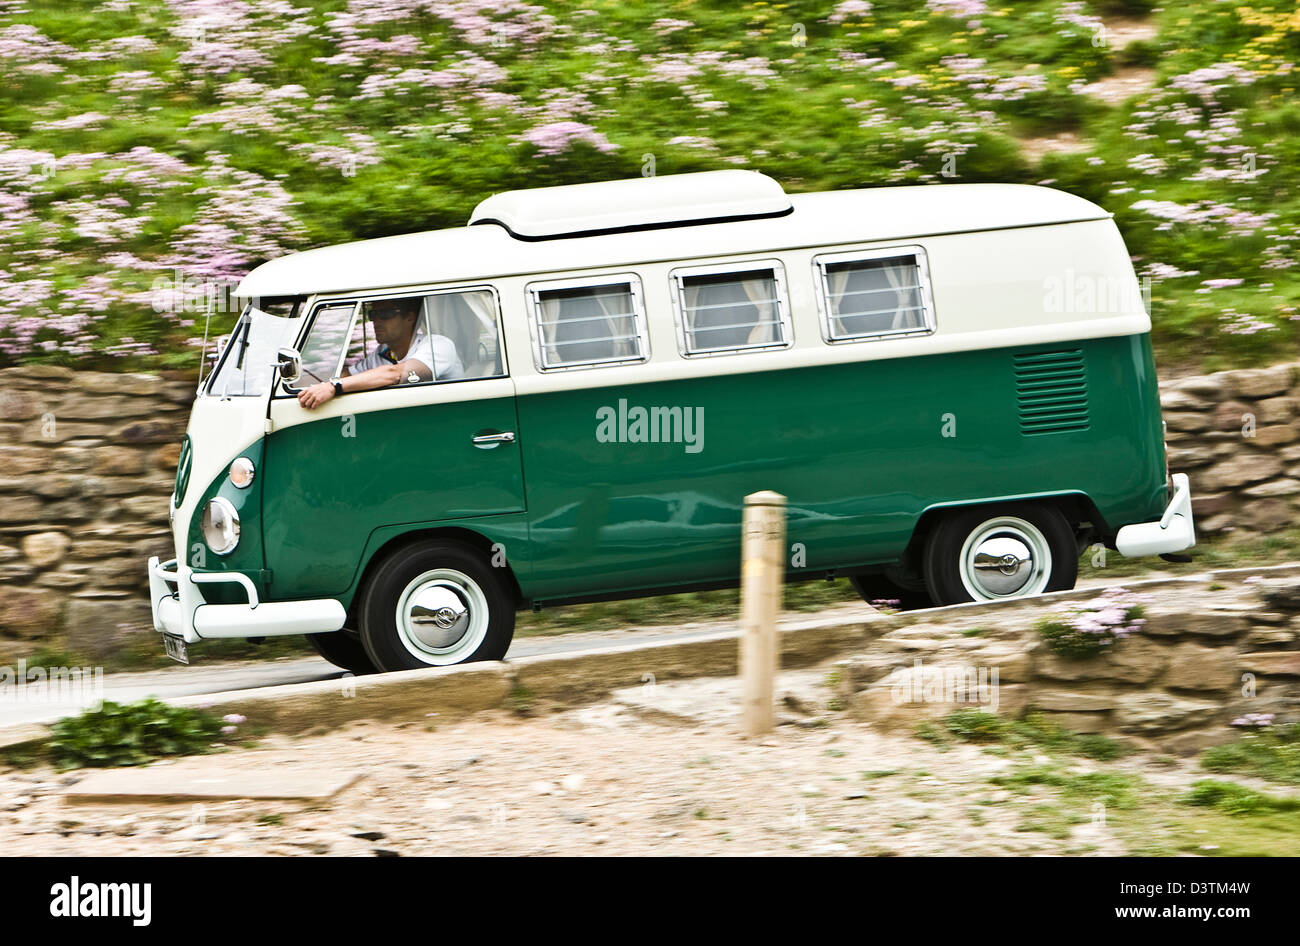 Green VW campervan on coastal road, St Agnes, Cornwall, UK - Stock Image